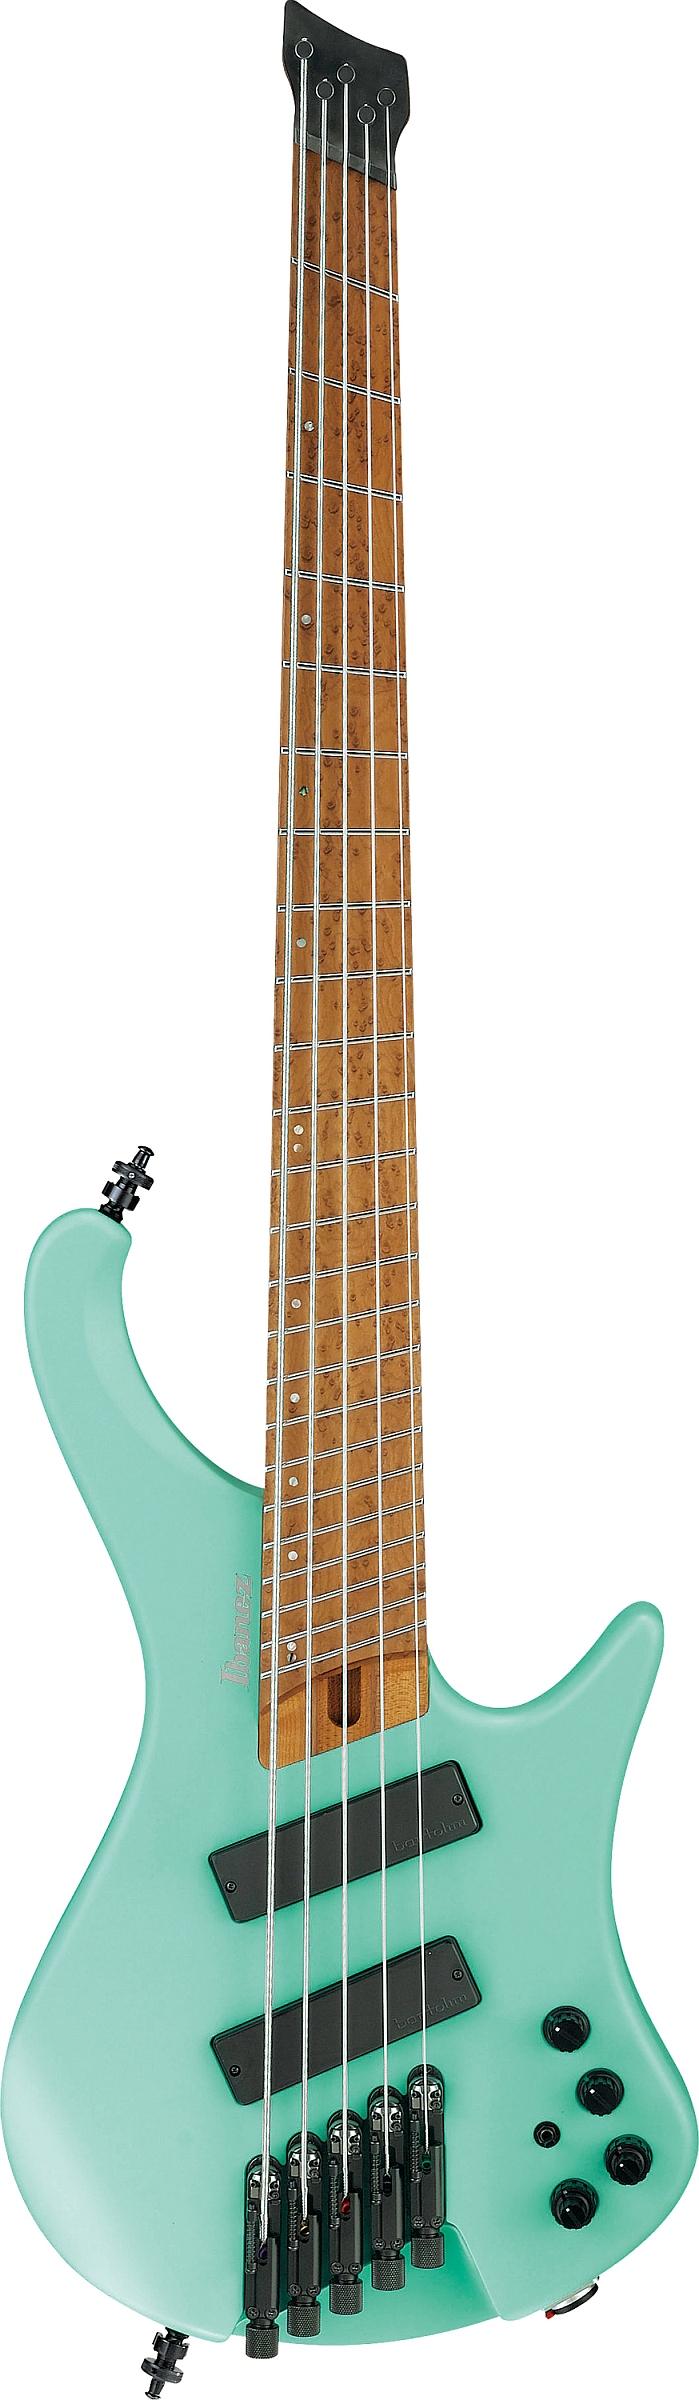 Ibanez EHB1005MS-SFM E-Bass 5-String Multiscale Sea Foam Green + Gigbag B-Stock